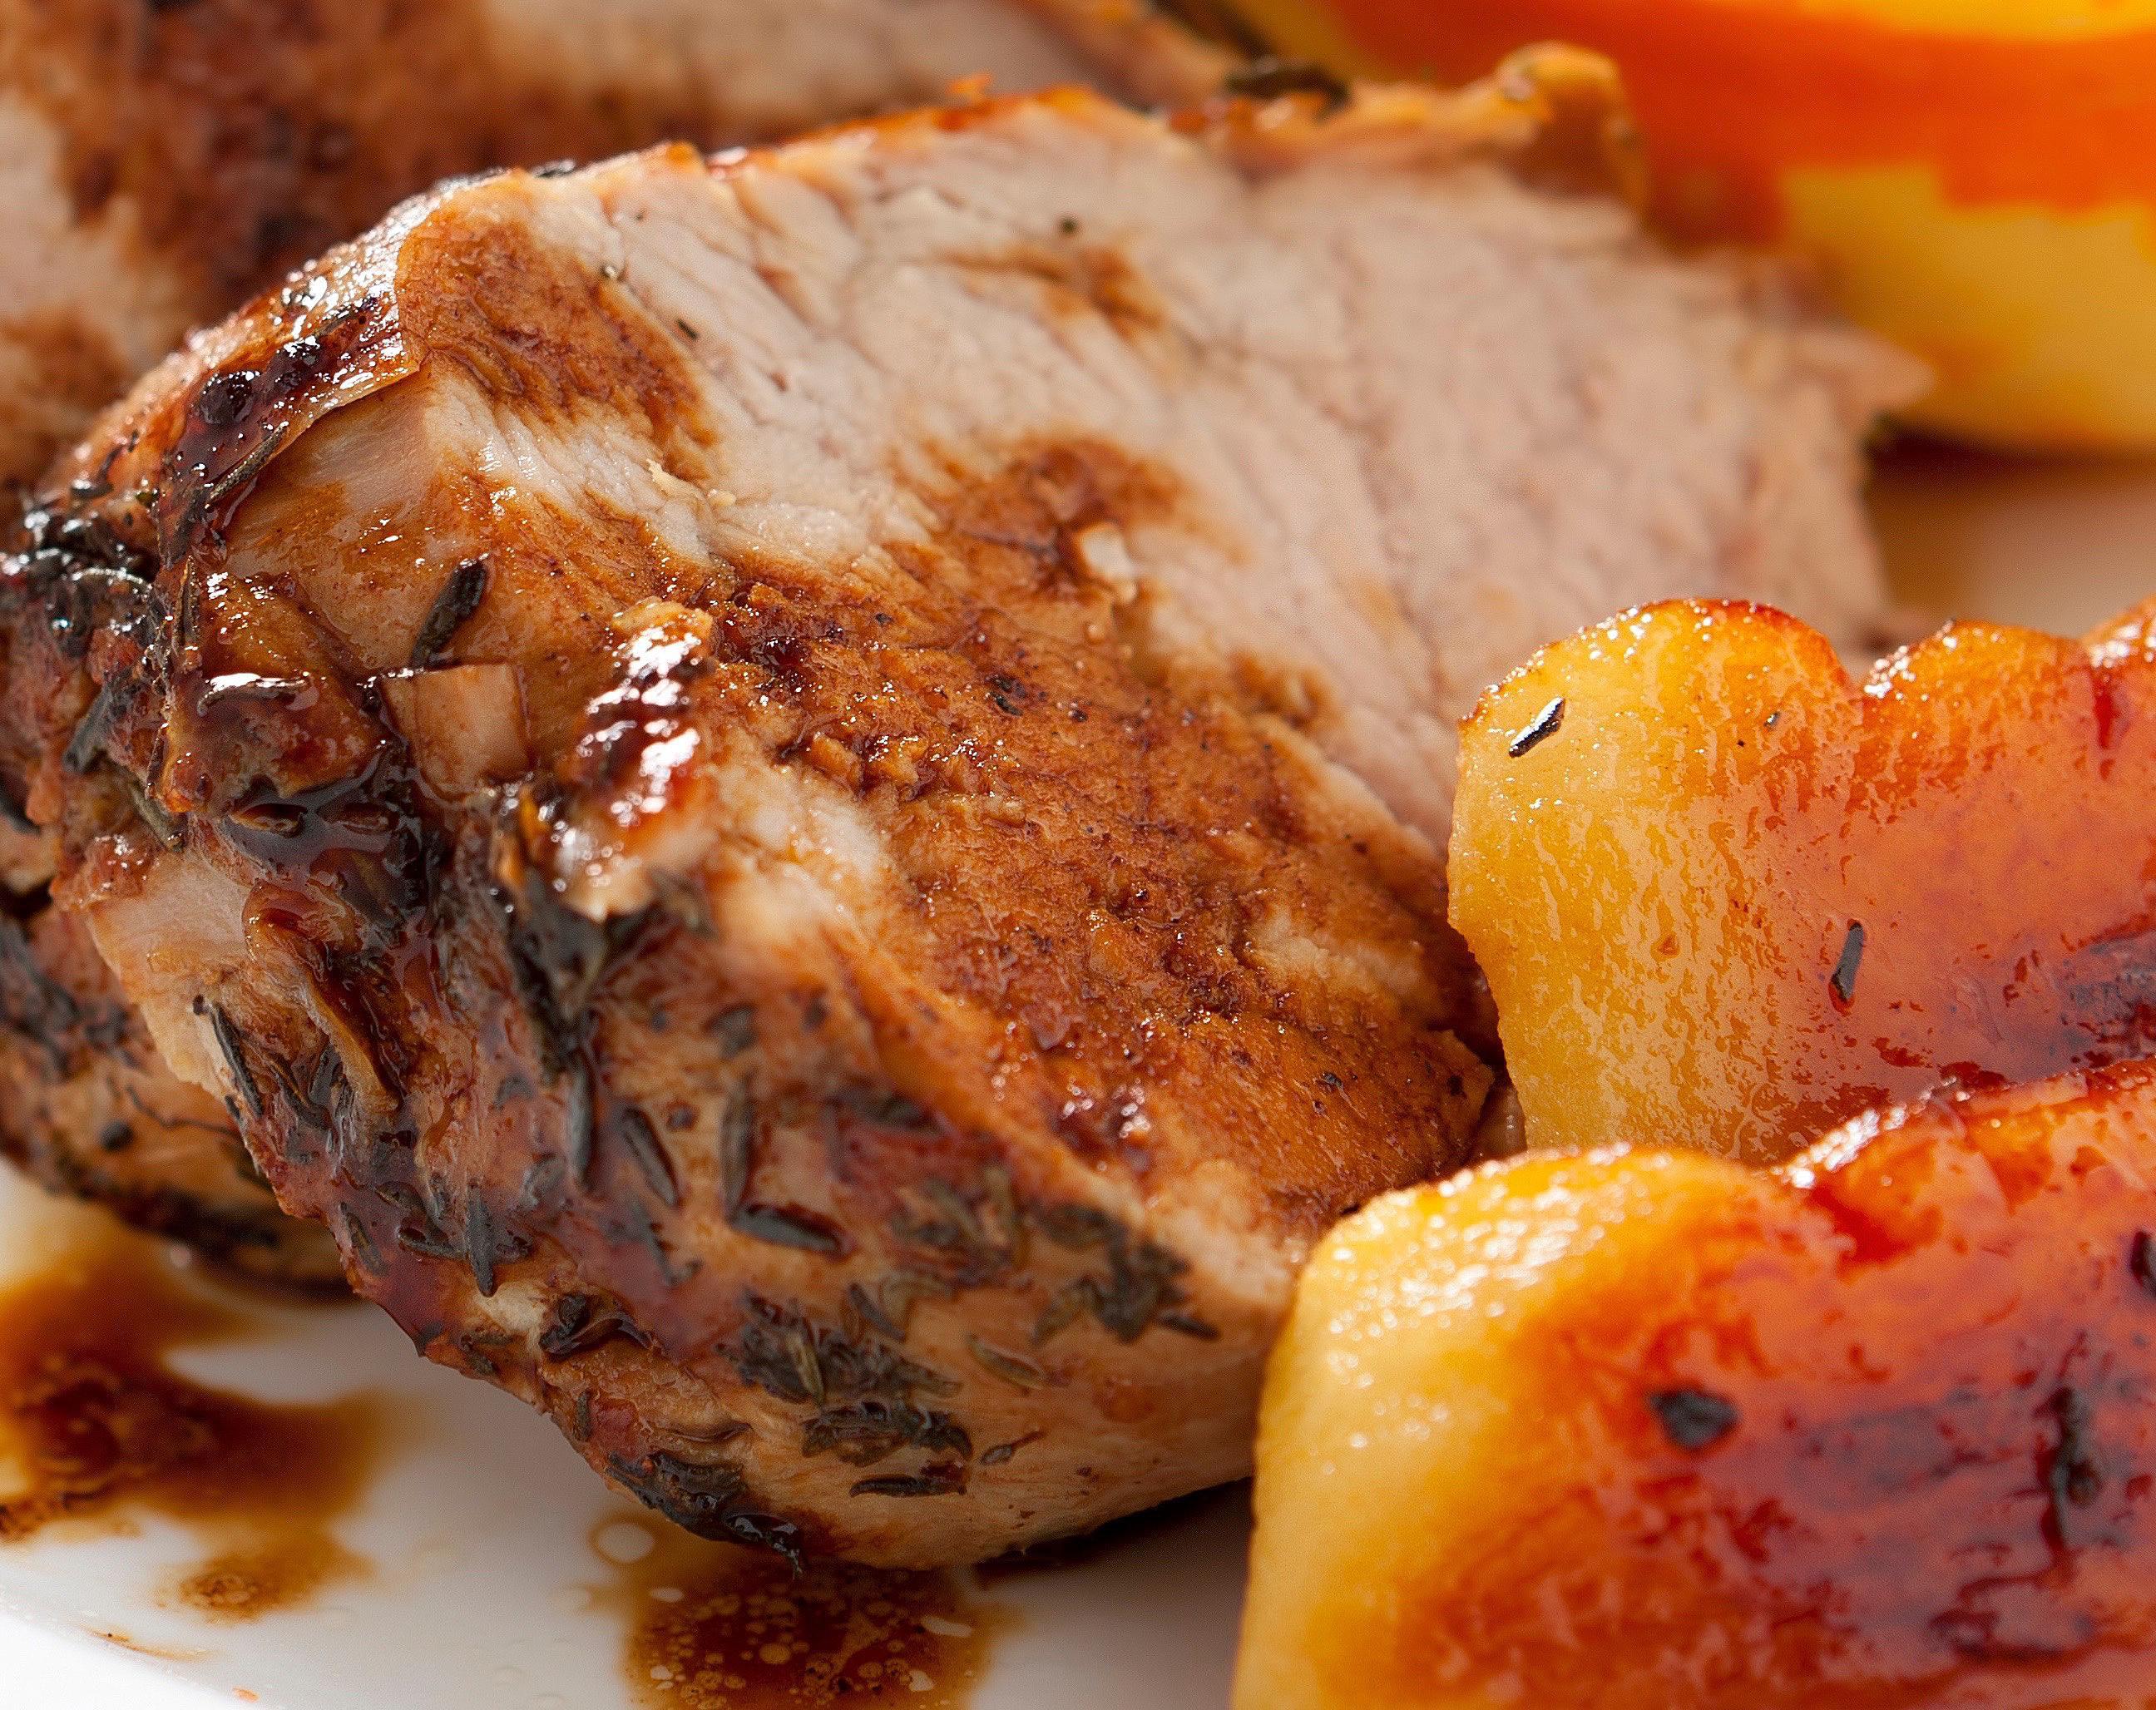 Apple-Glazed Crockpot Pork Roast